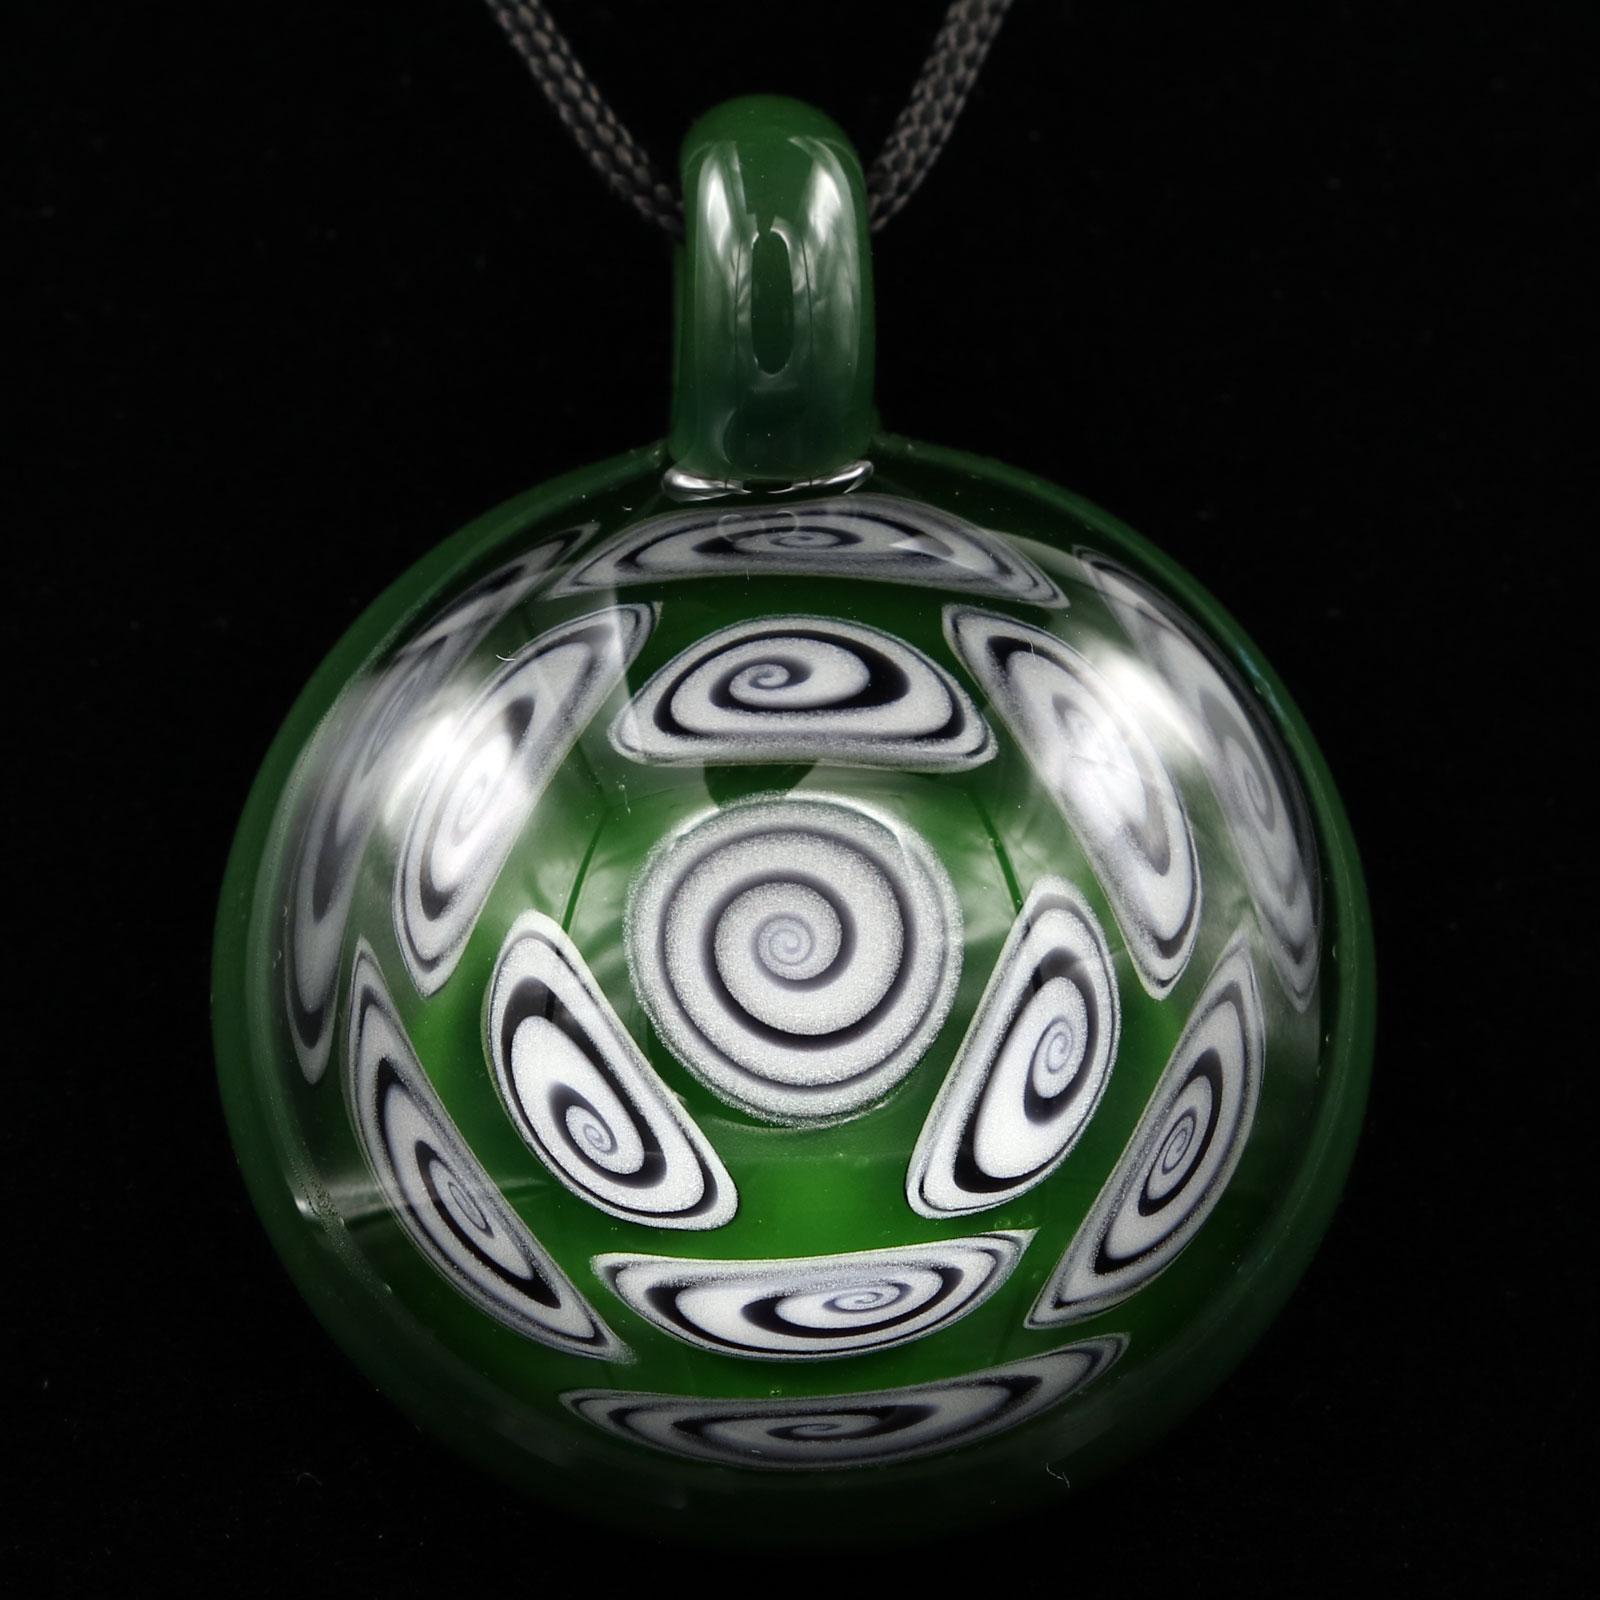 Kaja Glass – 13 Section Tree Hugger and Illuminati Microspiral Pendant